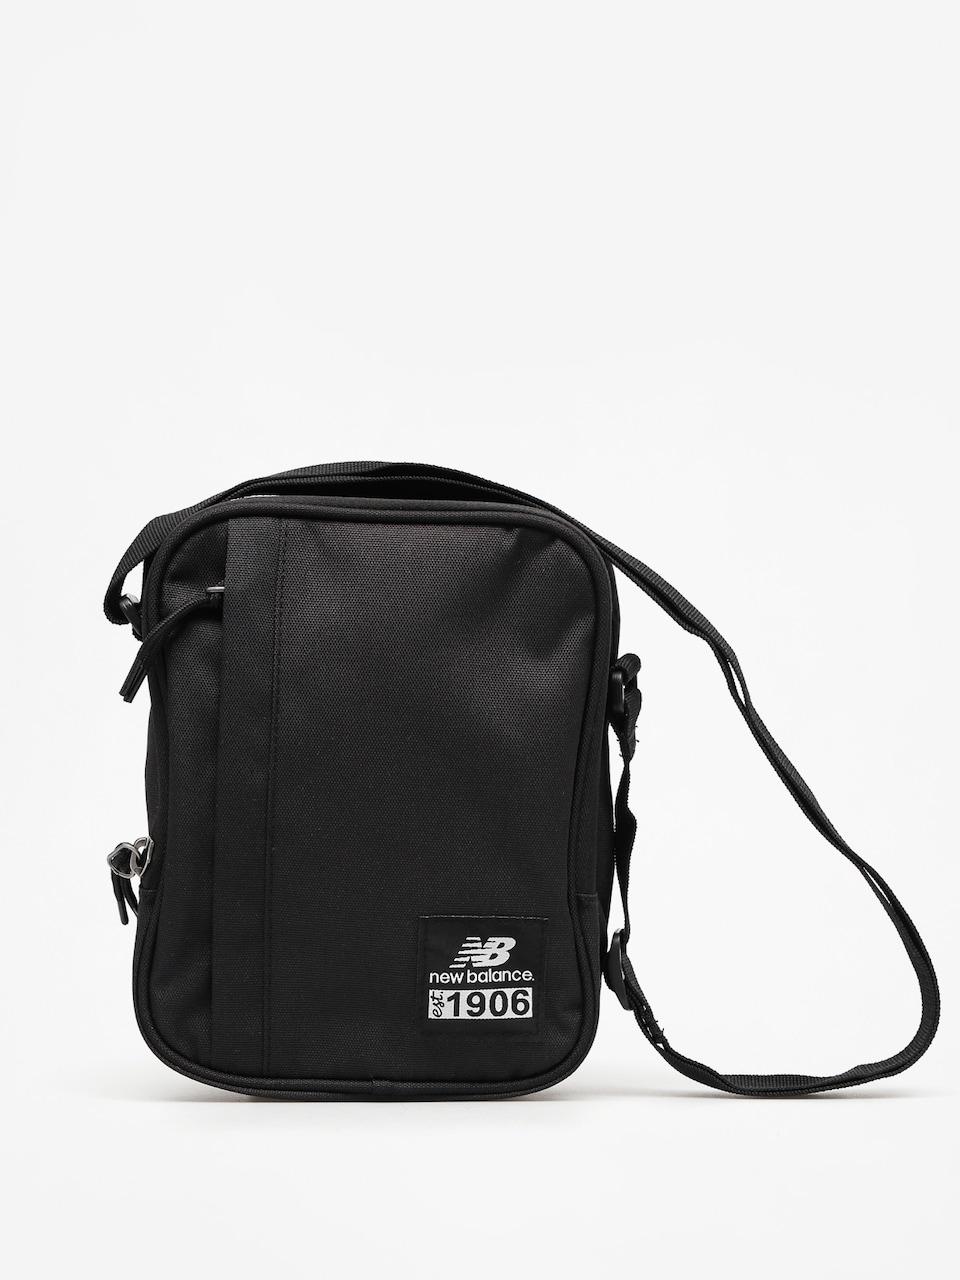 new balance cross body bag